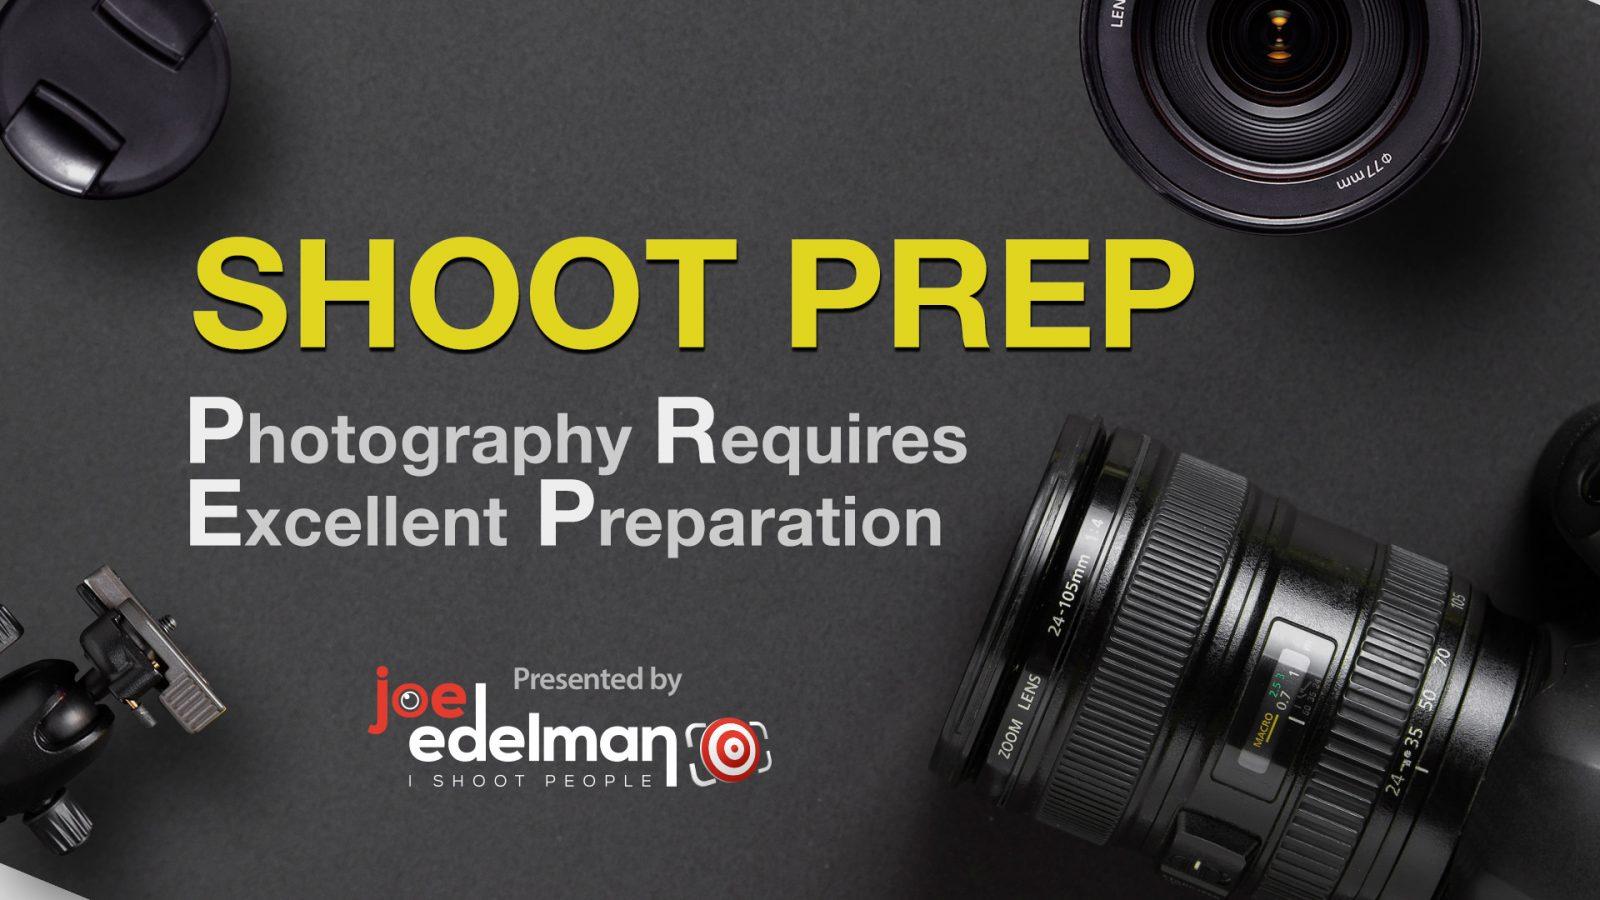 Shoot Prep: Great Photograph Requires Excellent Preparation